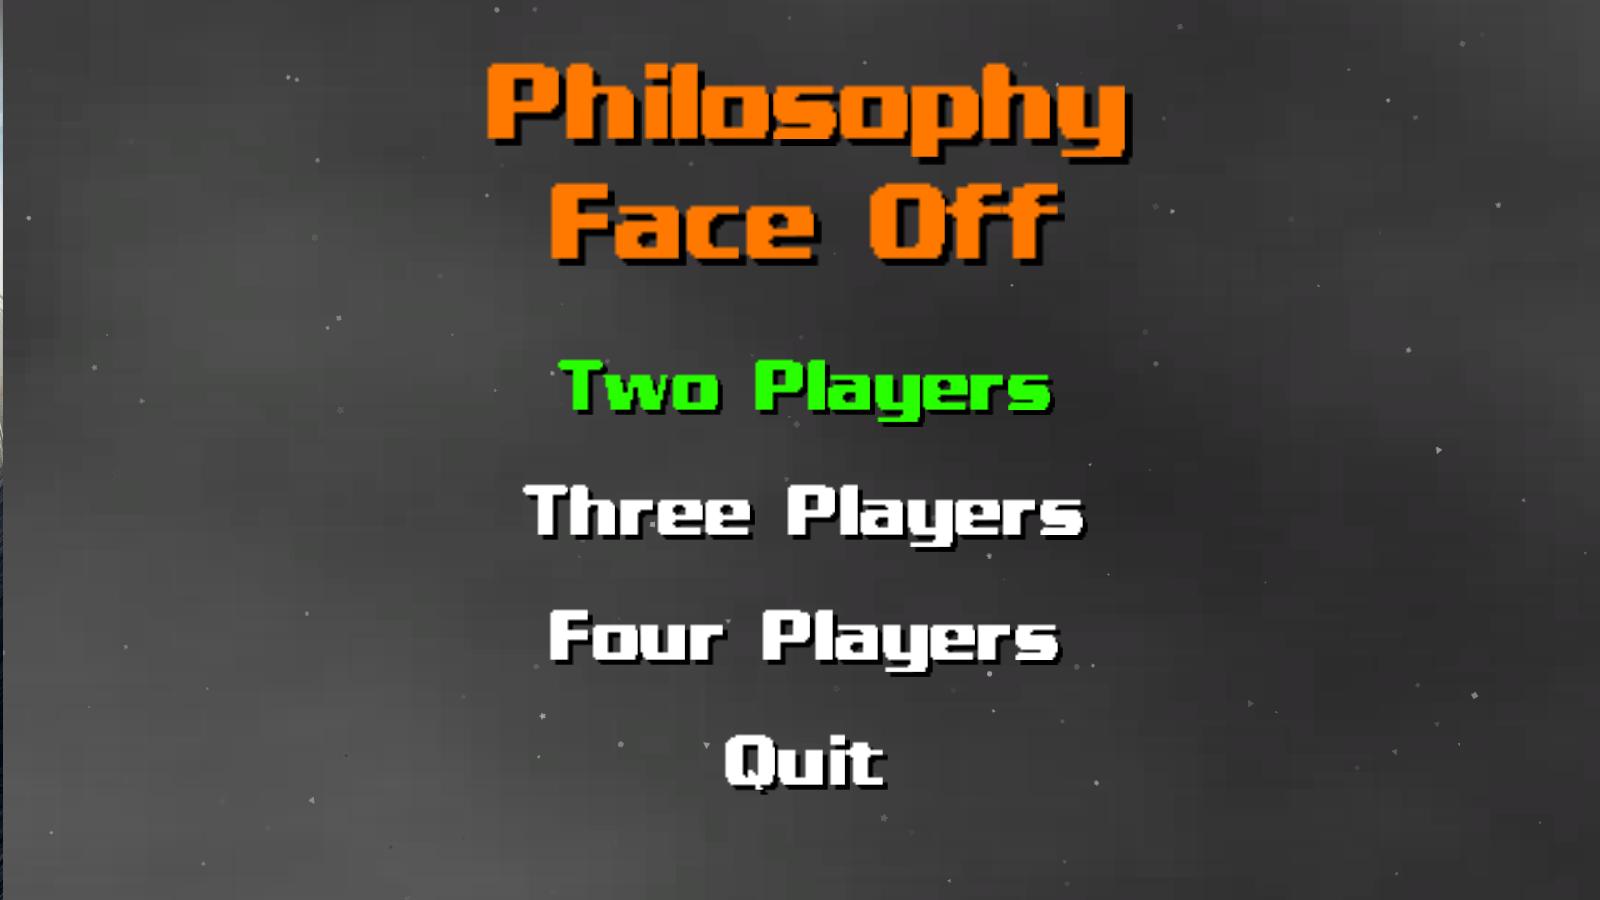 Philosophy Face-off!